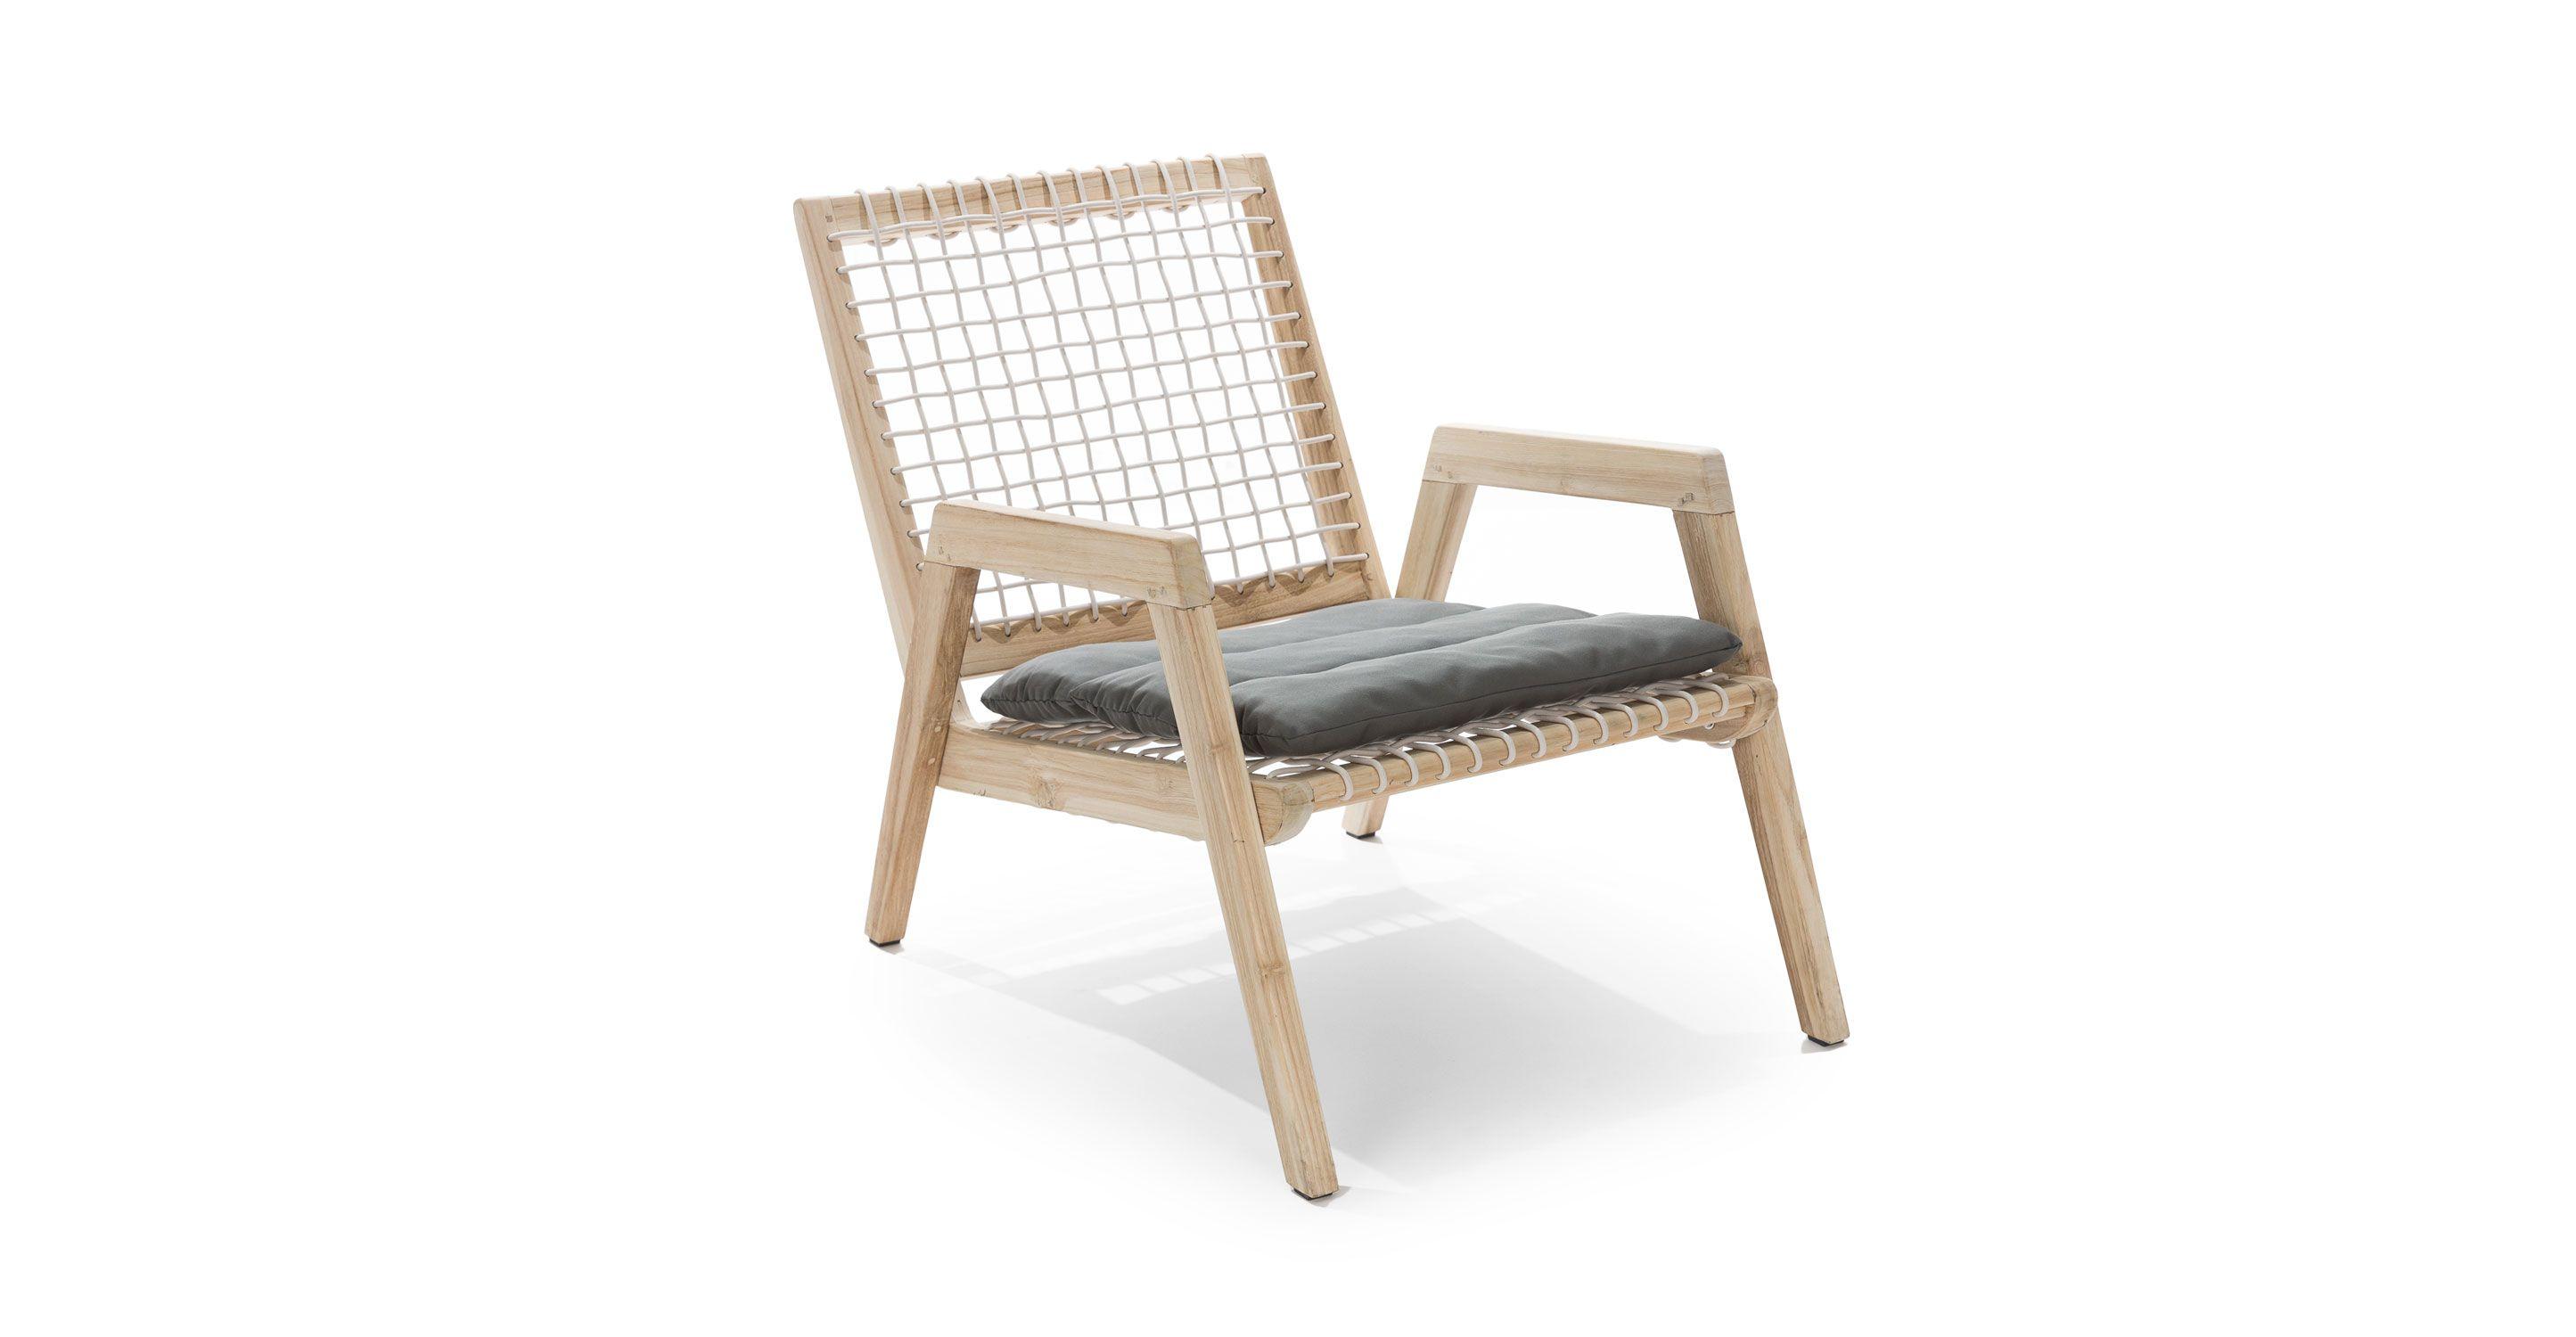 teak outdoor lounge chair article teaka wooden outdoor furniture